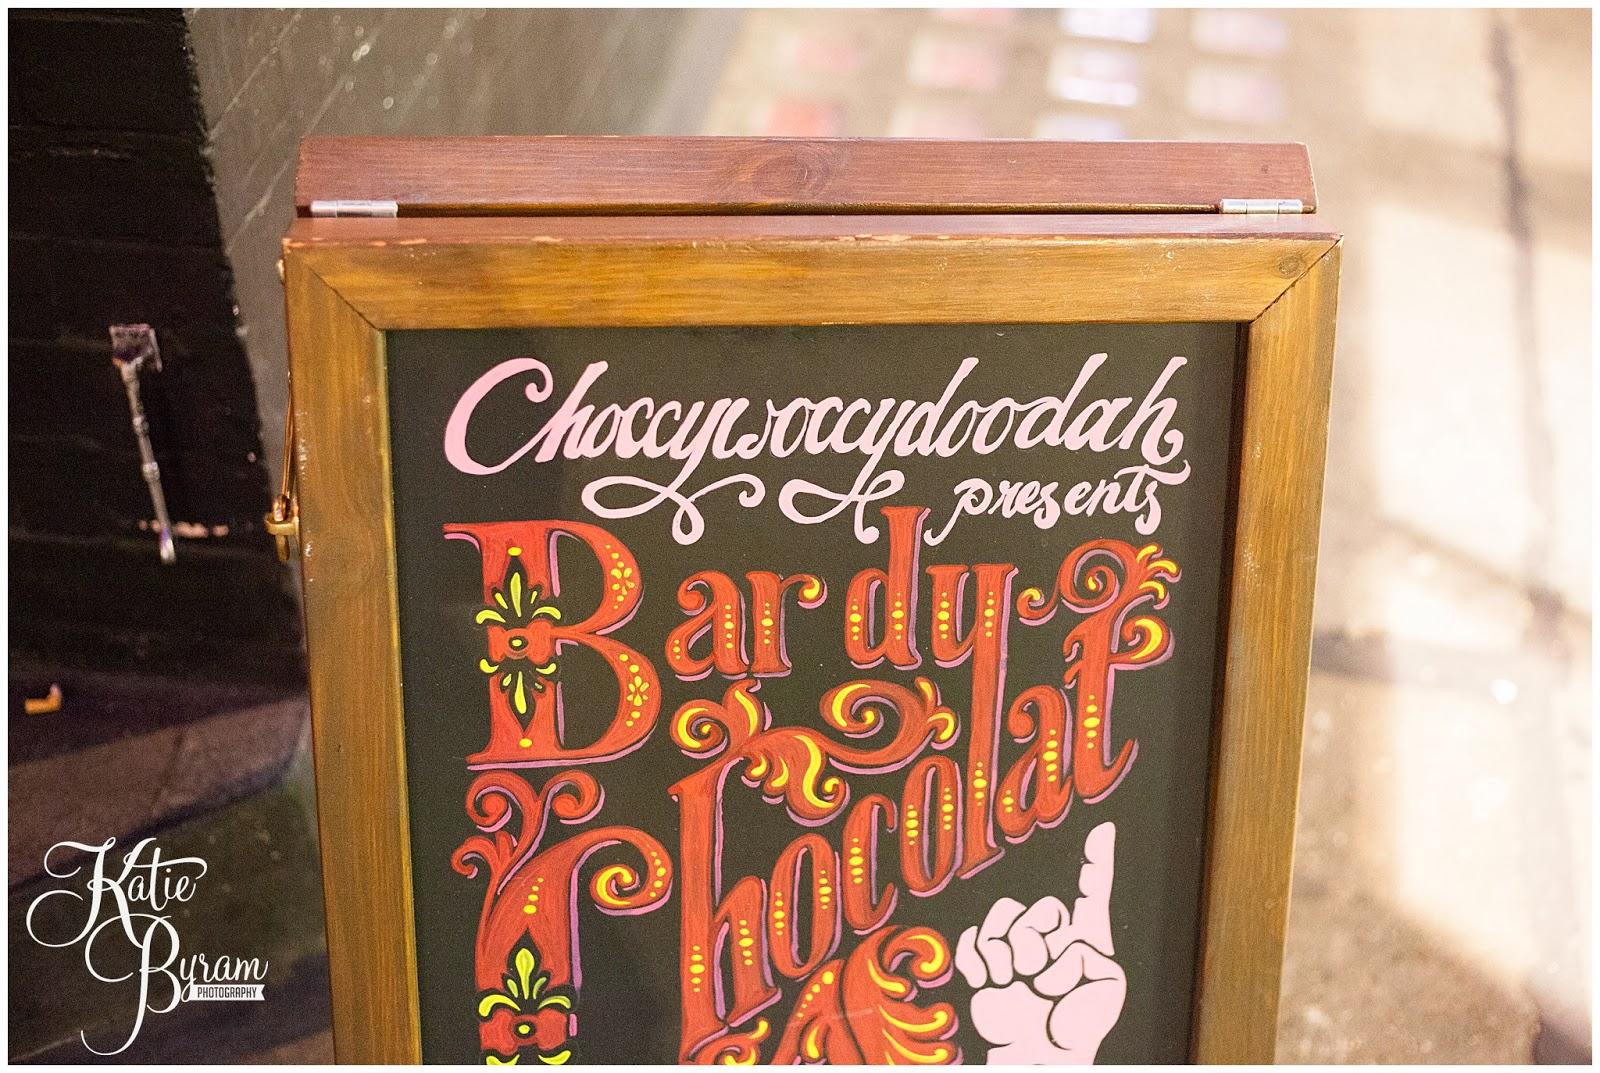 choccywoccydoodah, choccywoccy shop, choccywoccydoodah cafe, all you need is love cake, london photographer, quirky wedding photography london, harry potter land, harry potter studio tour, katie byram photography, making of harry potter, warner brothers studio, winter wonderland, london engagement shoot, pre-wedding shoot london,